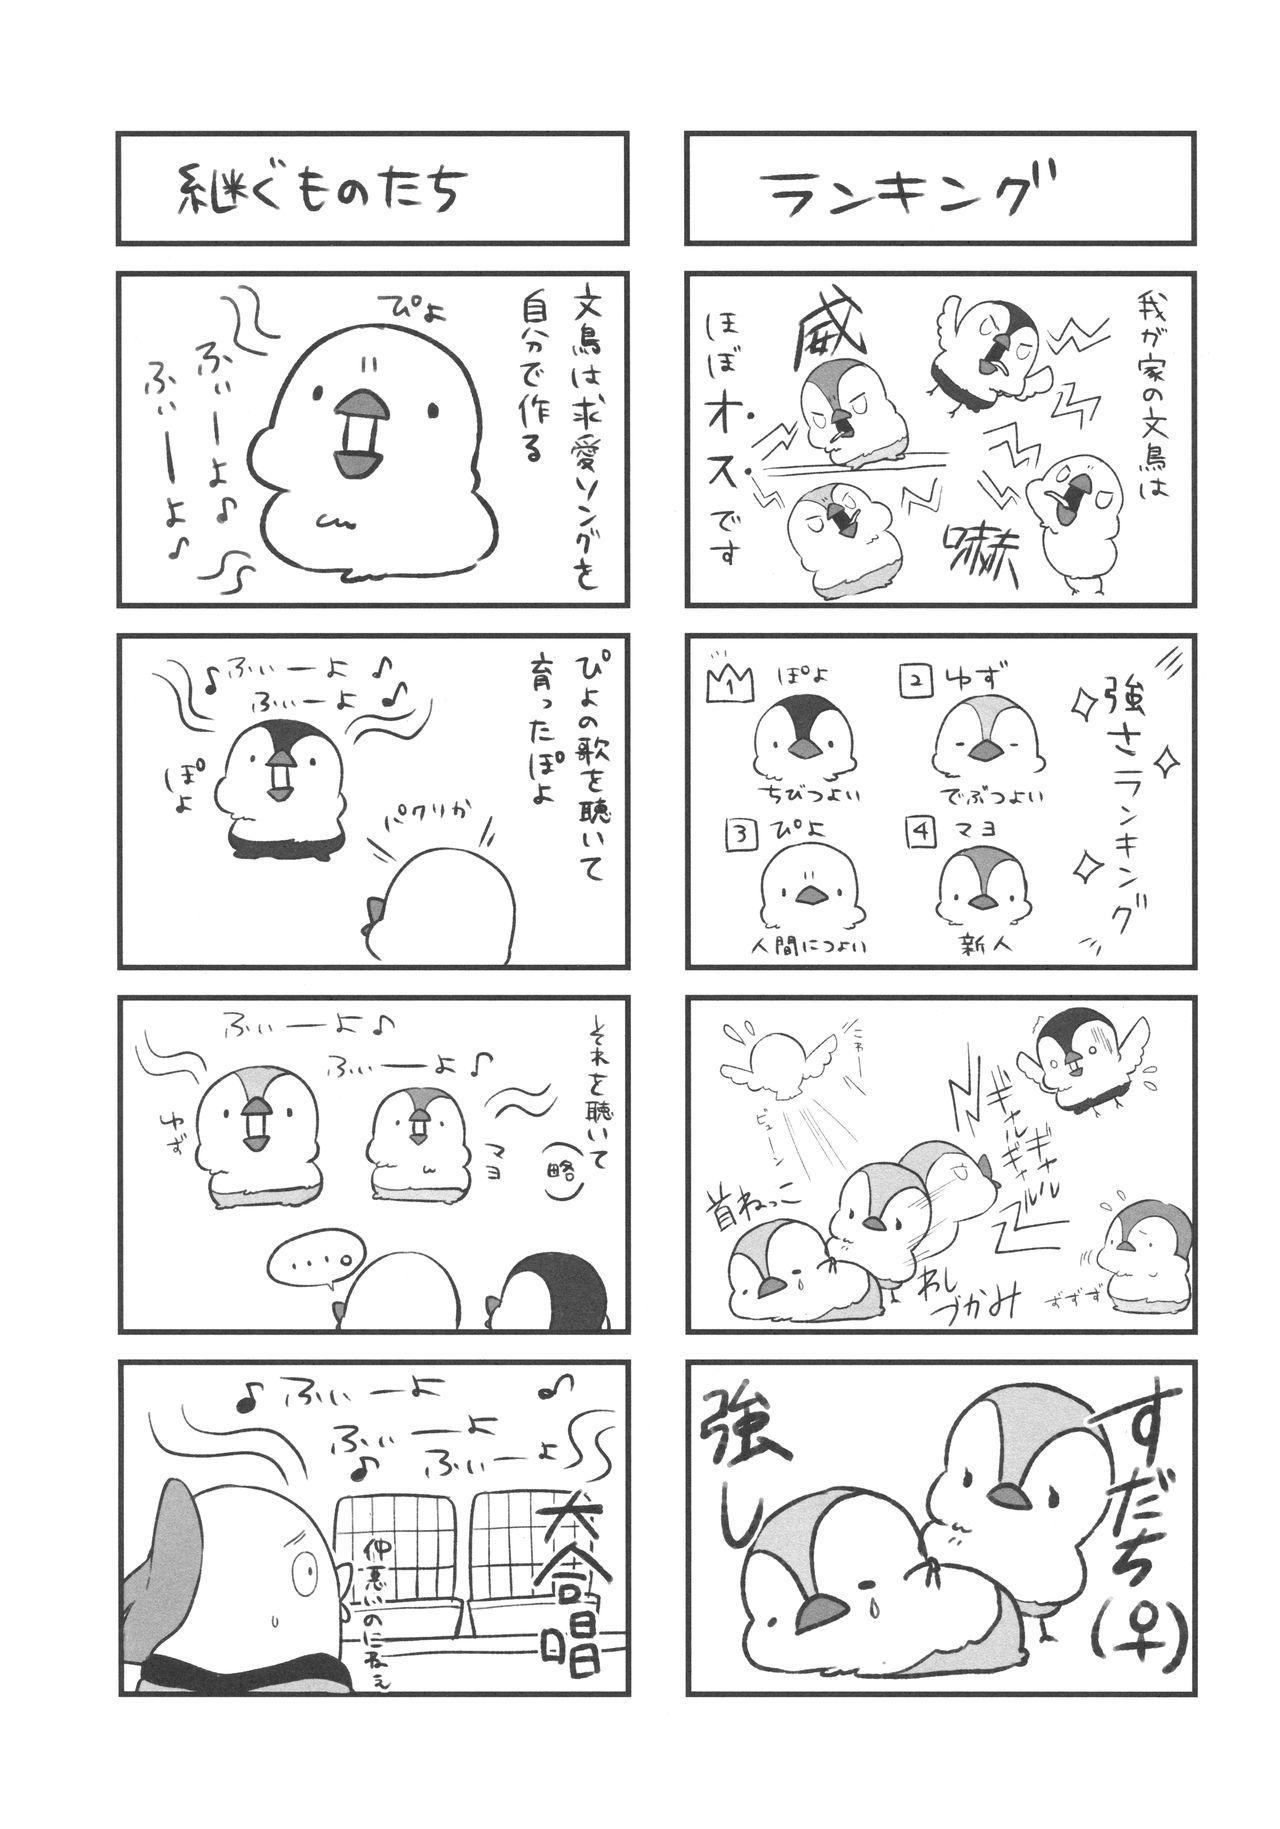 Torokeru Fumi-Cup 23